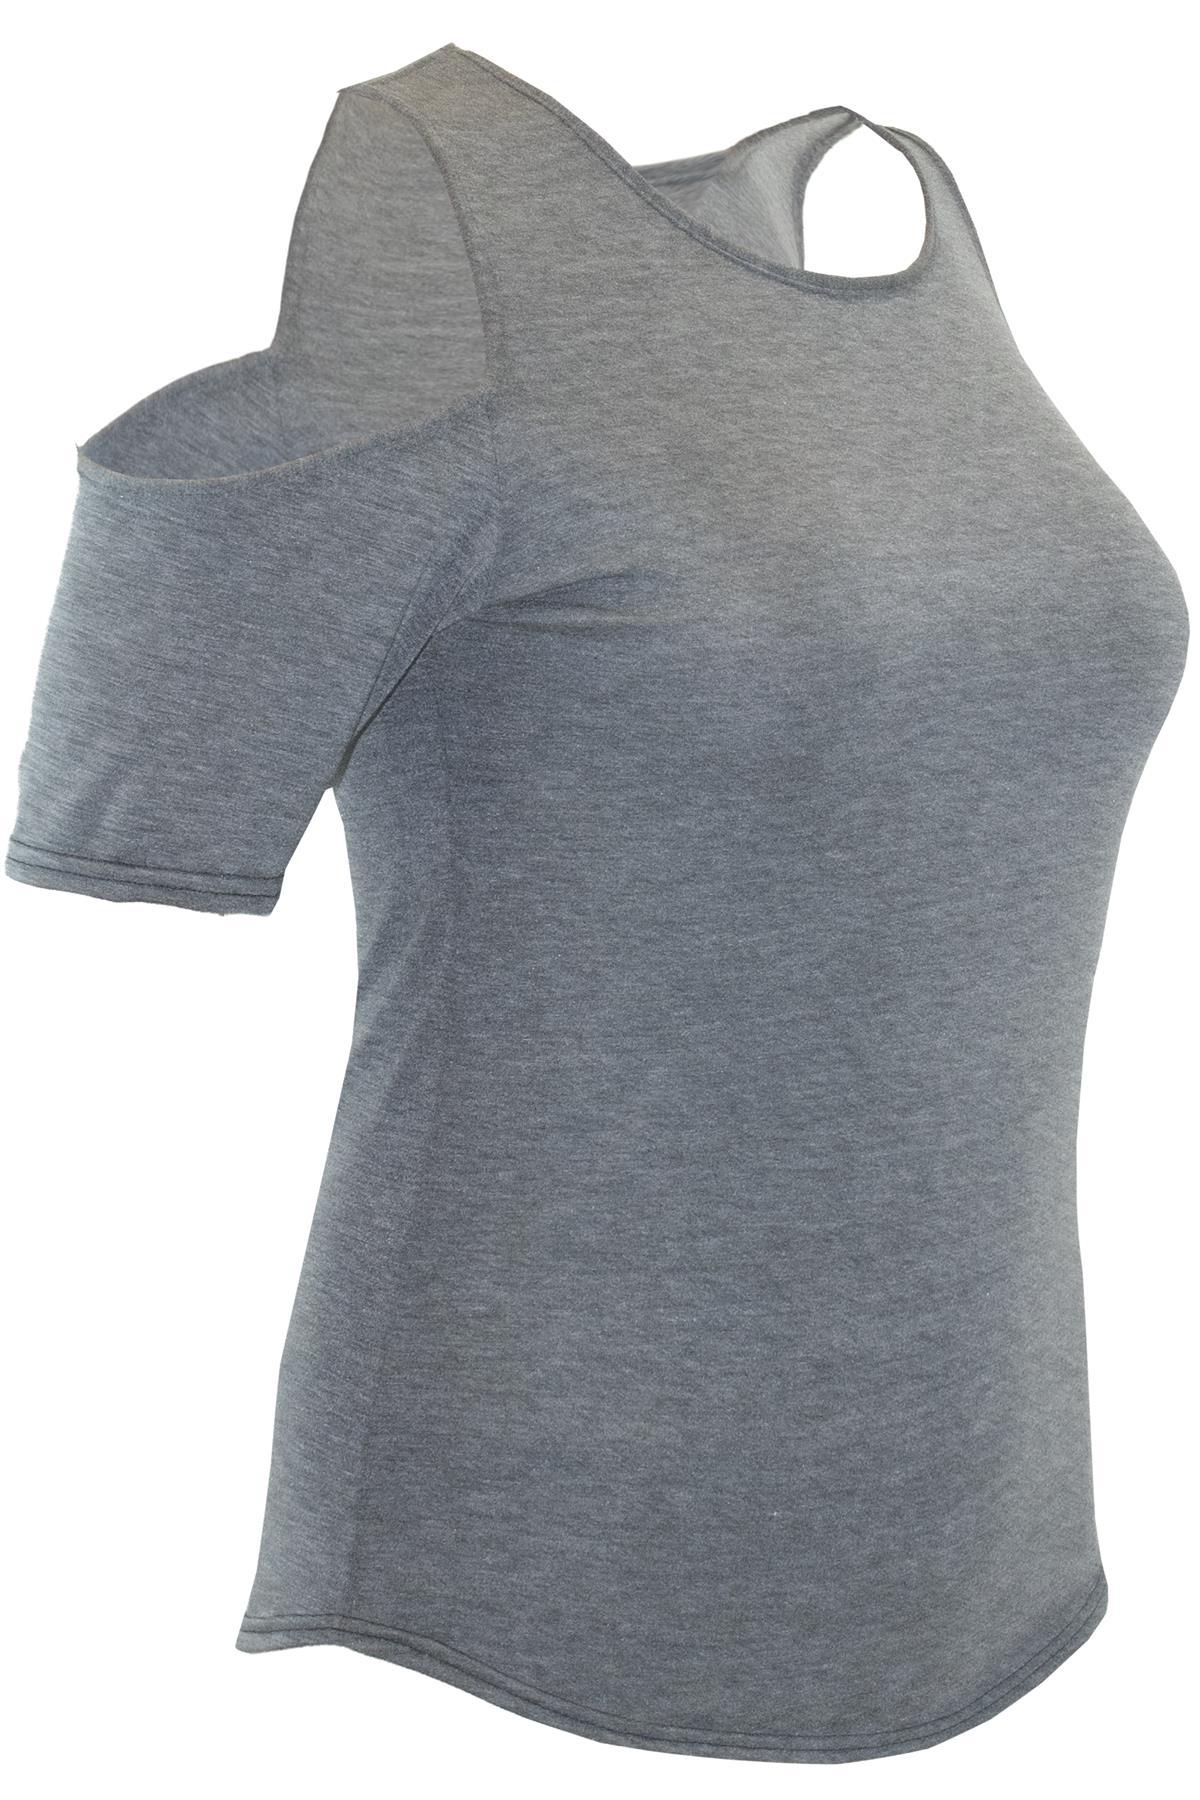 Plus Size Womens Ladies Baggy Cold Shoulder Curved Hem Top